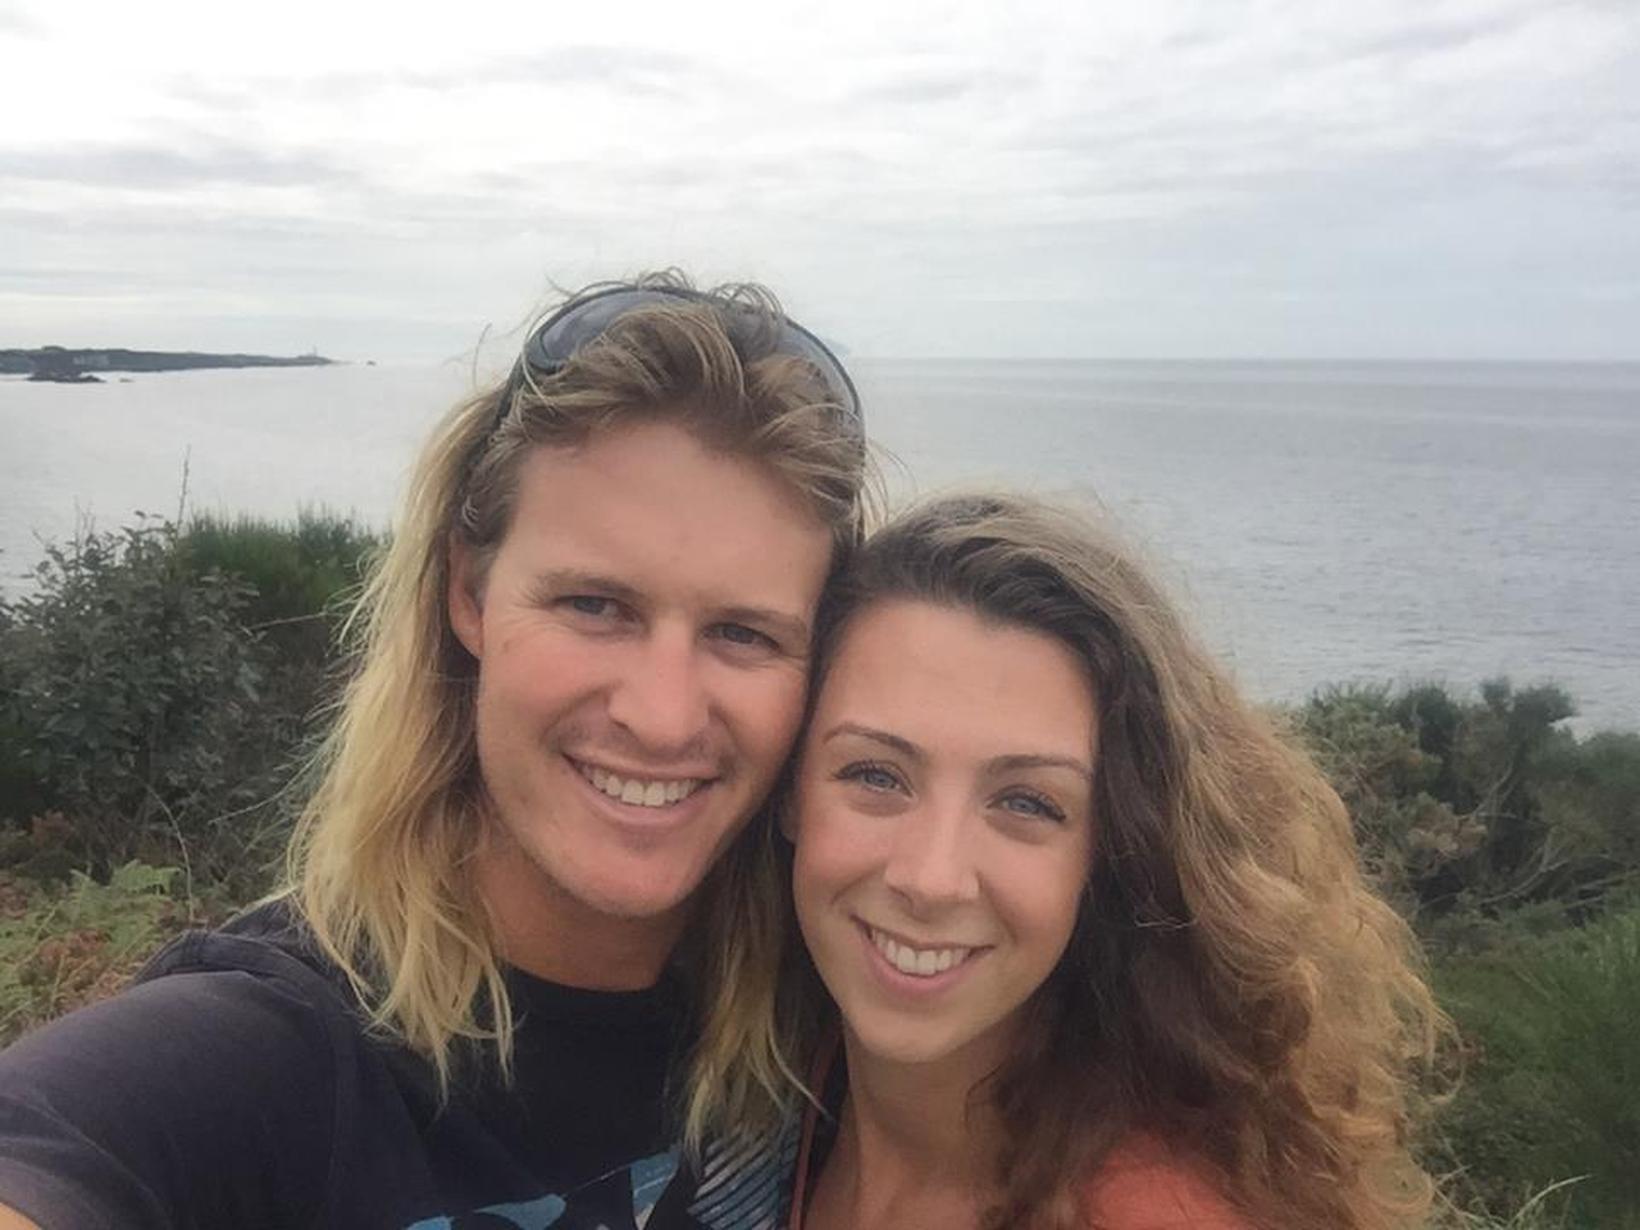 Mia & Warwick from Vancouver, British Columbia, Canada